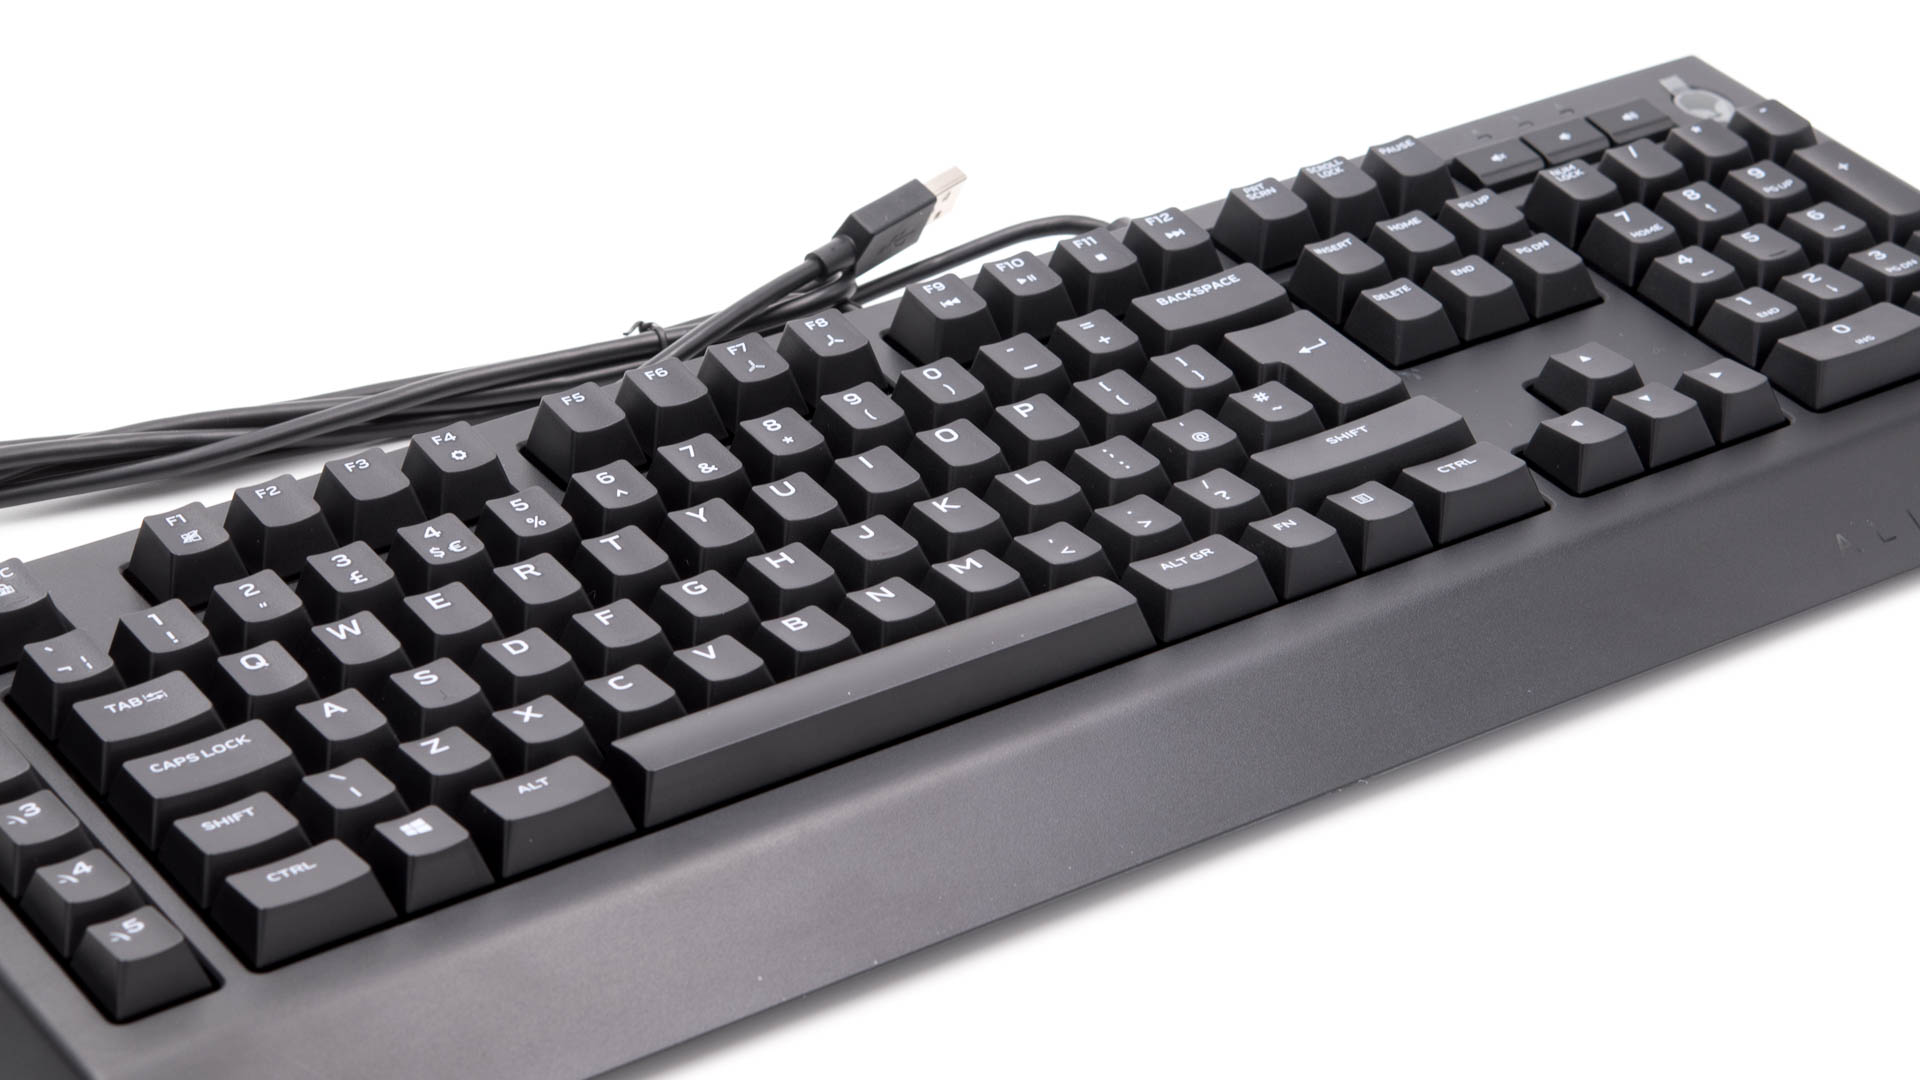 die alienware aw568 gaming tastatur im test techtest. Black Bedroom Furniture Sets. Home Design Ideas